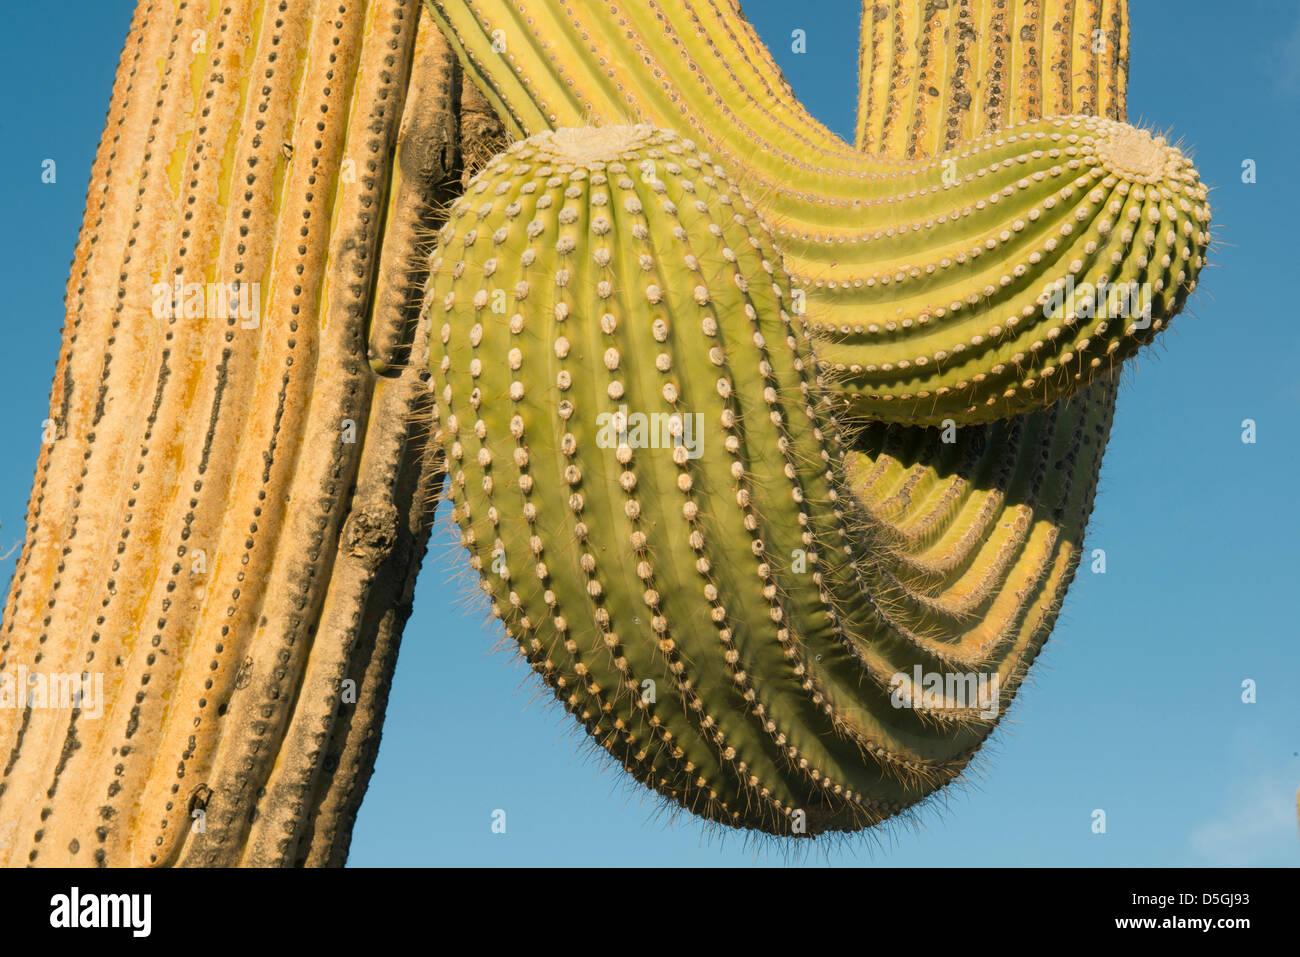 Saguaro Kaktus (Carnegiea Gigantea) Saguaro National Park, in der Nähe von Tucson, Arizona, USA Stockfoto